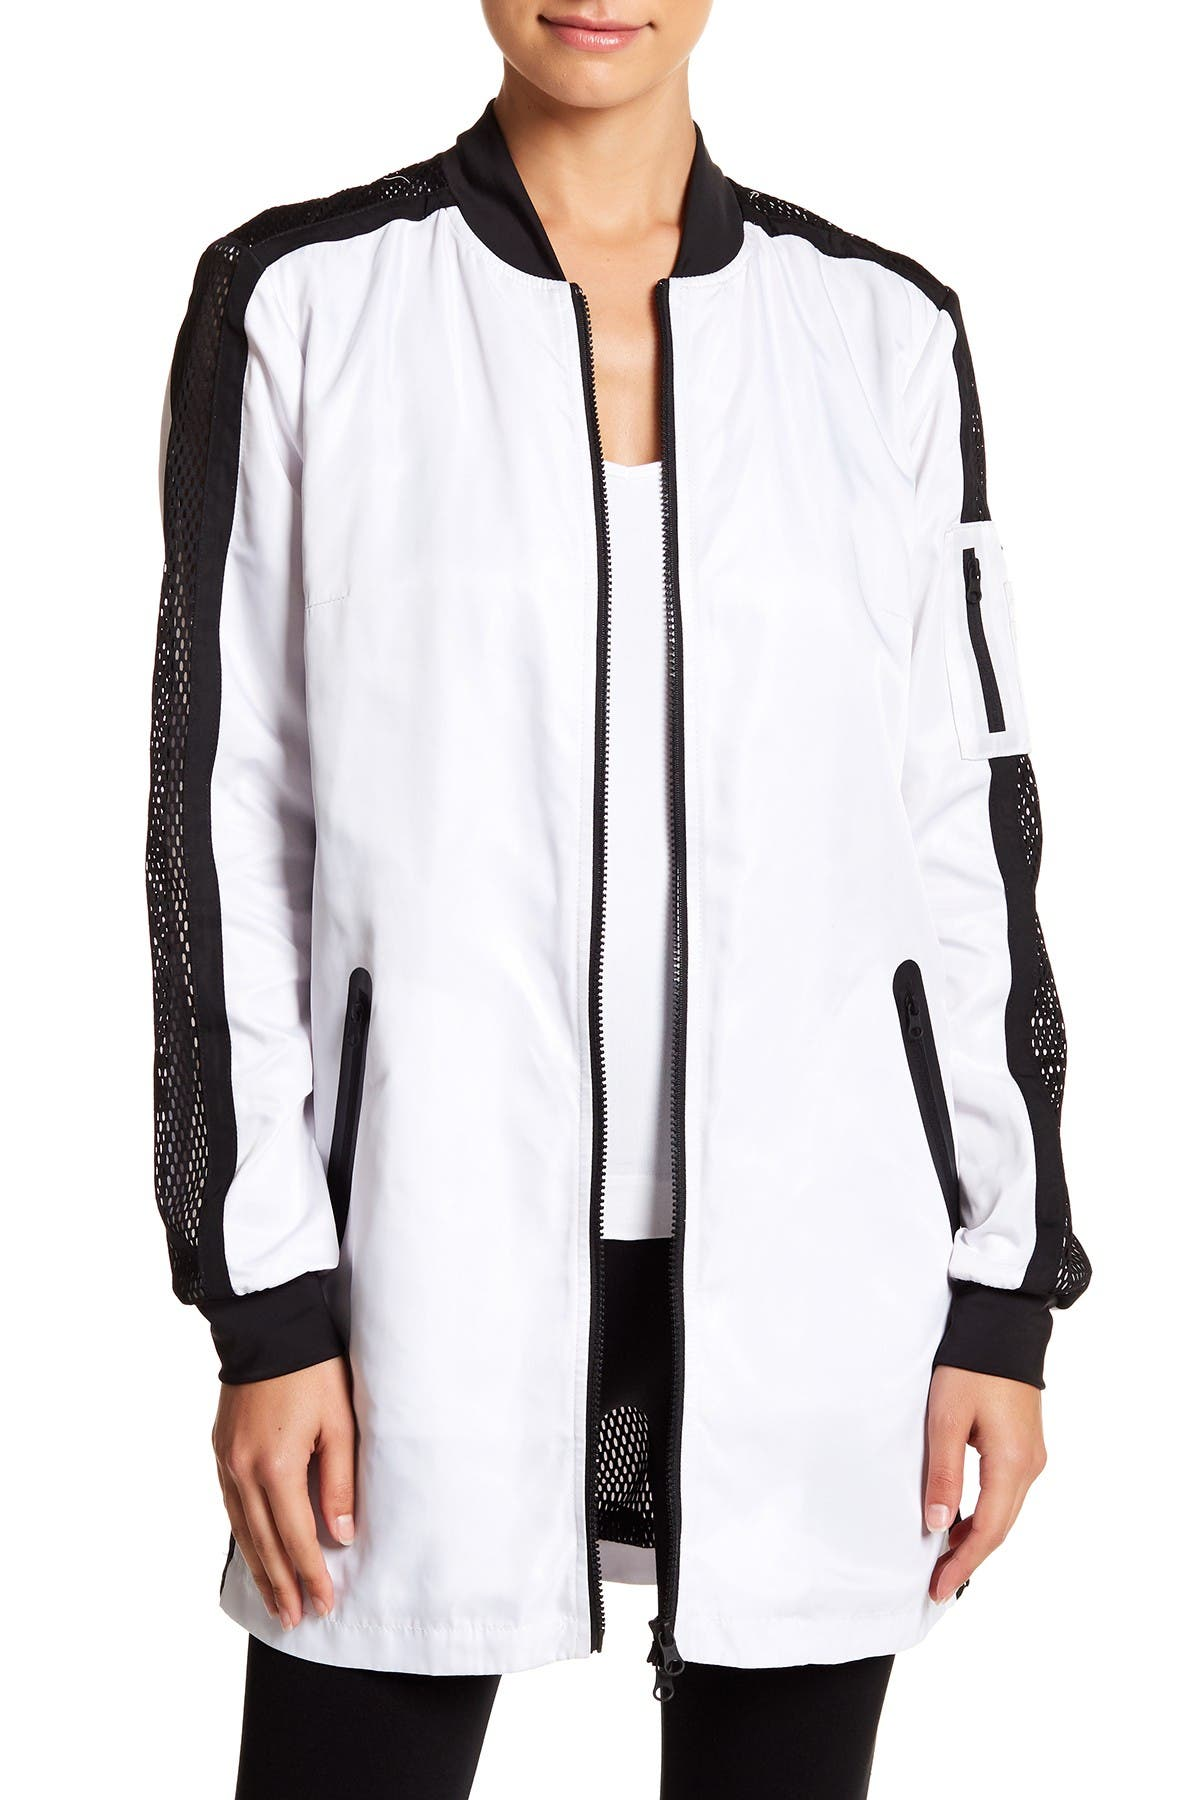 Image of Blanc Noir Boyfriend Mesh Panel Bomber Jacket